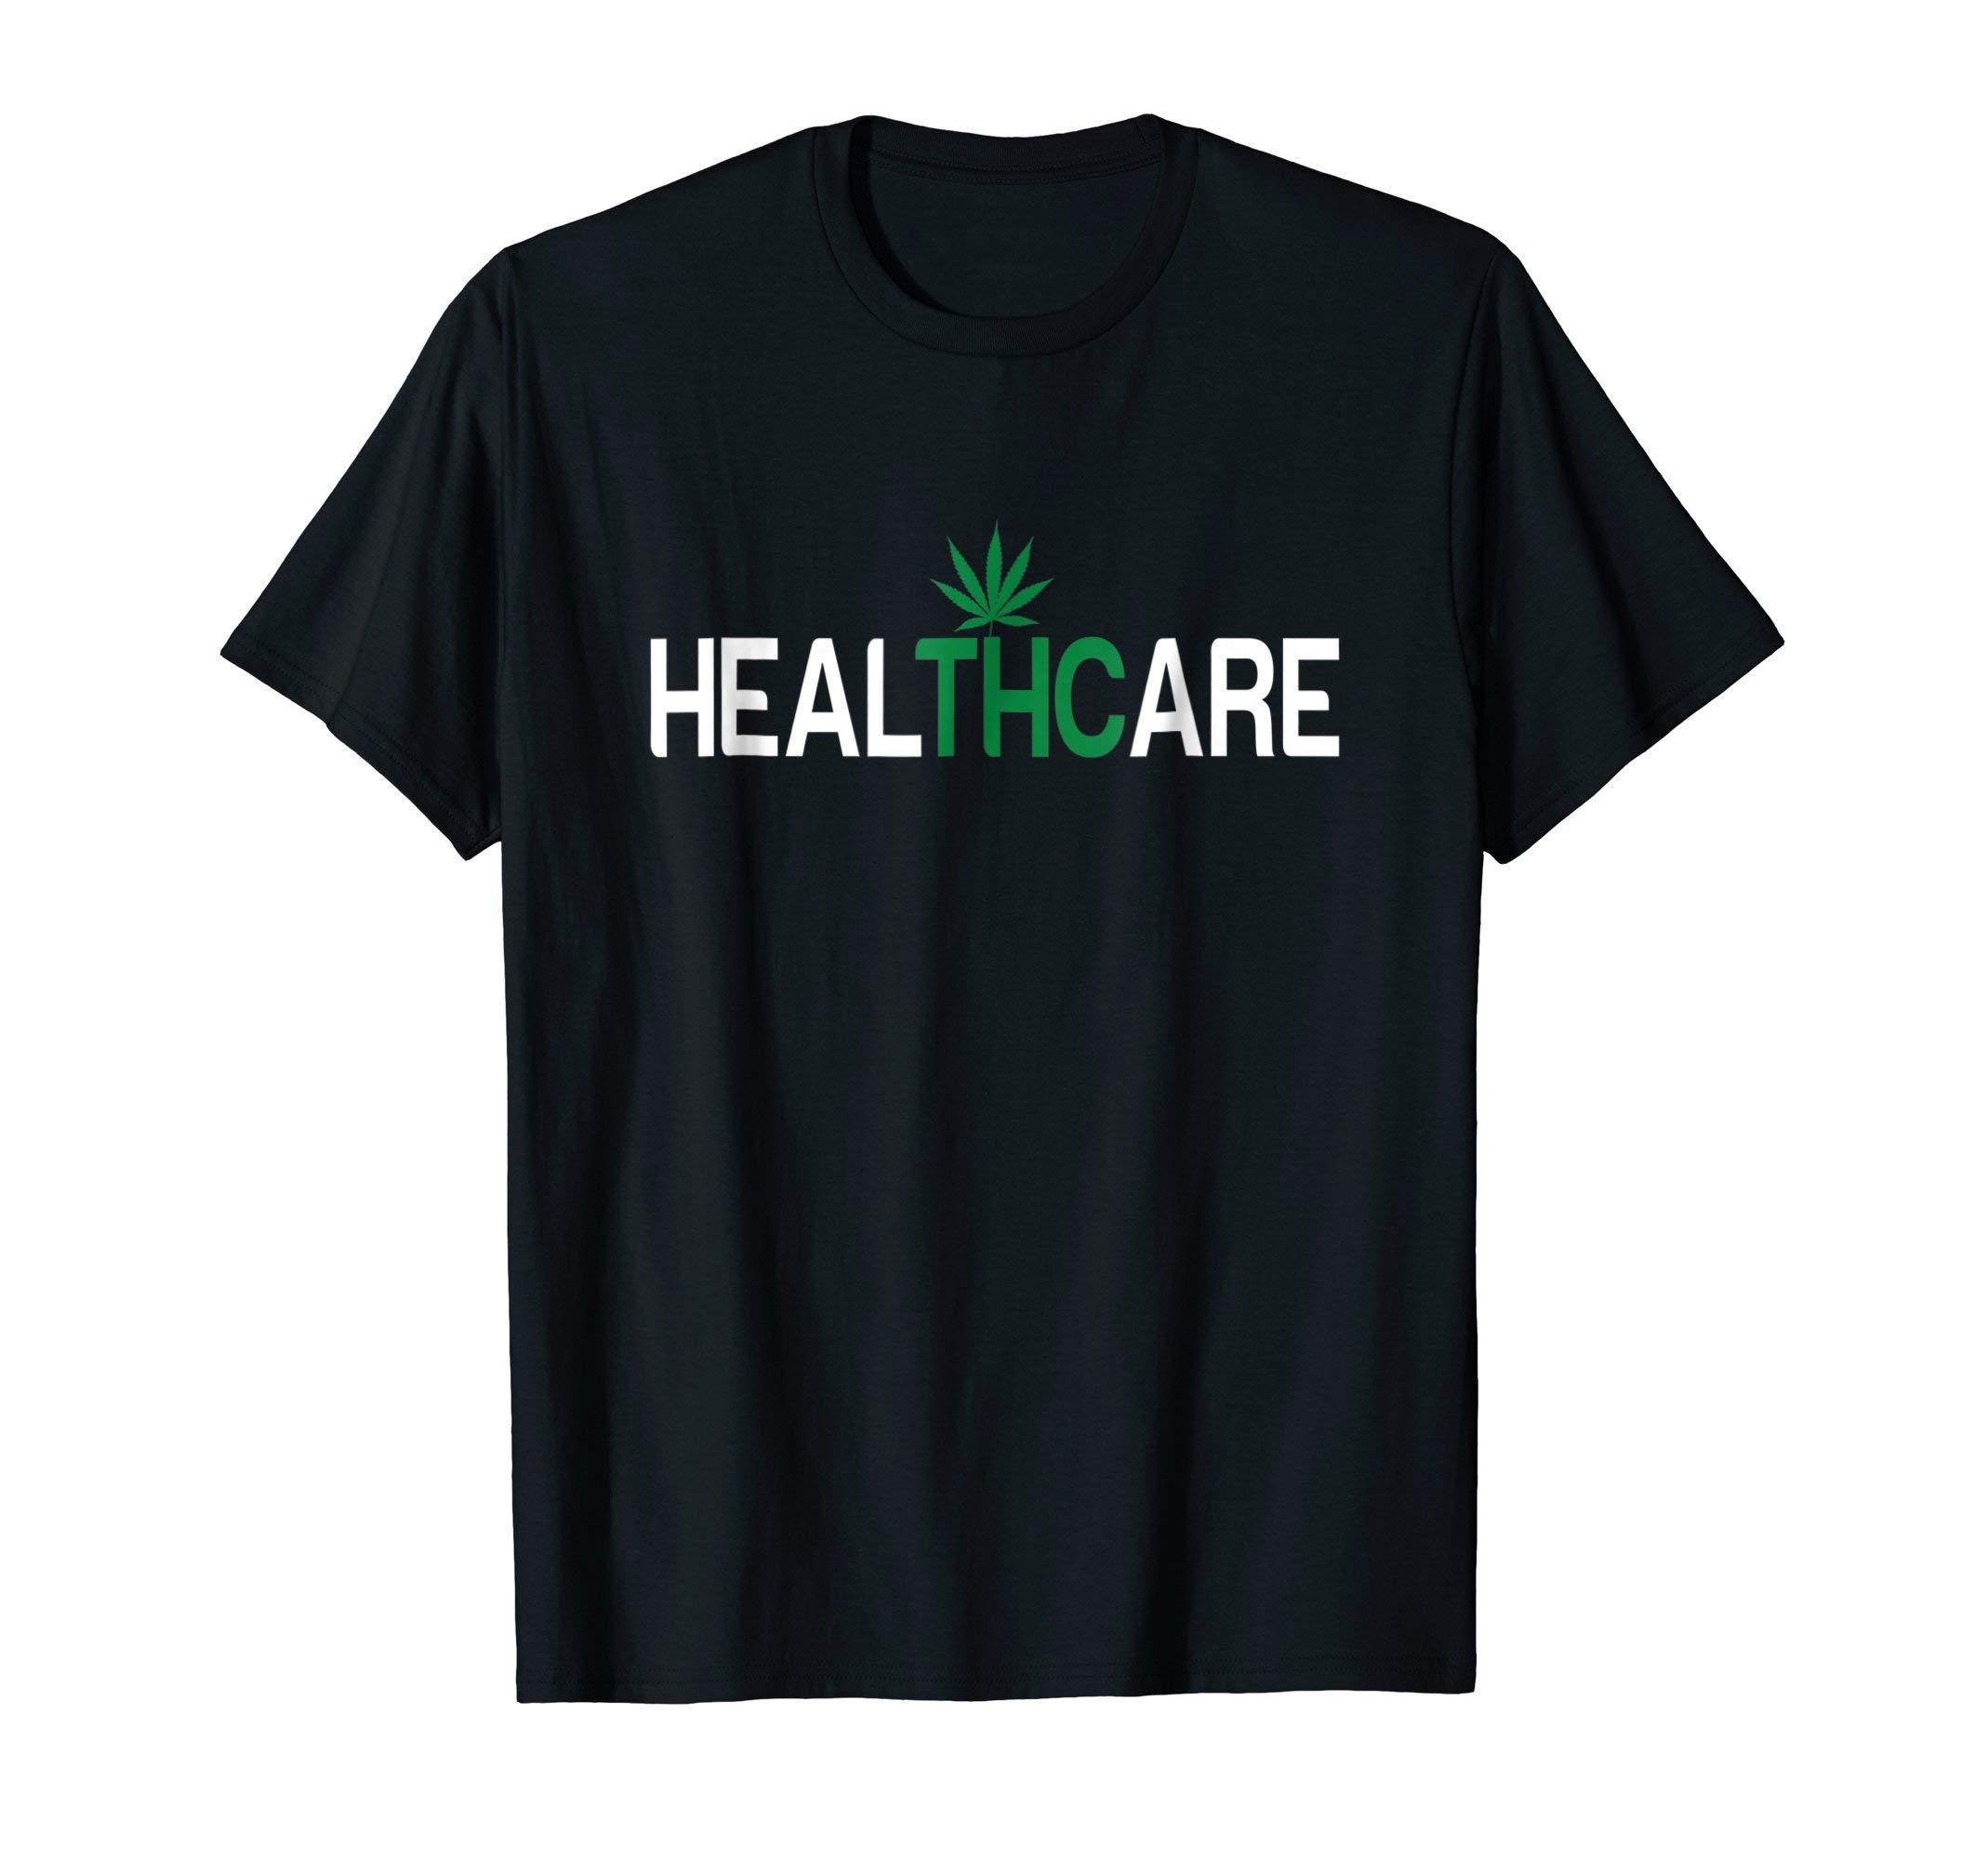 Medical Marijuana HealTHCare Shirt – THC